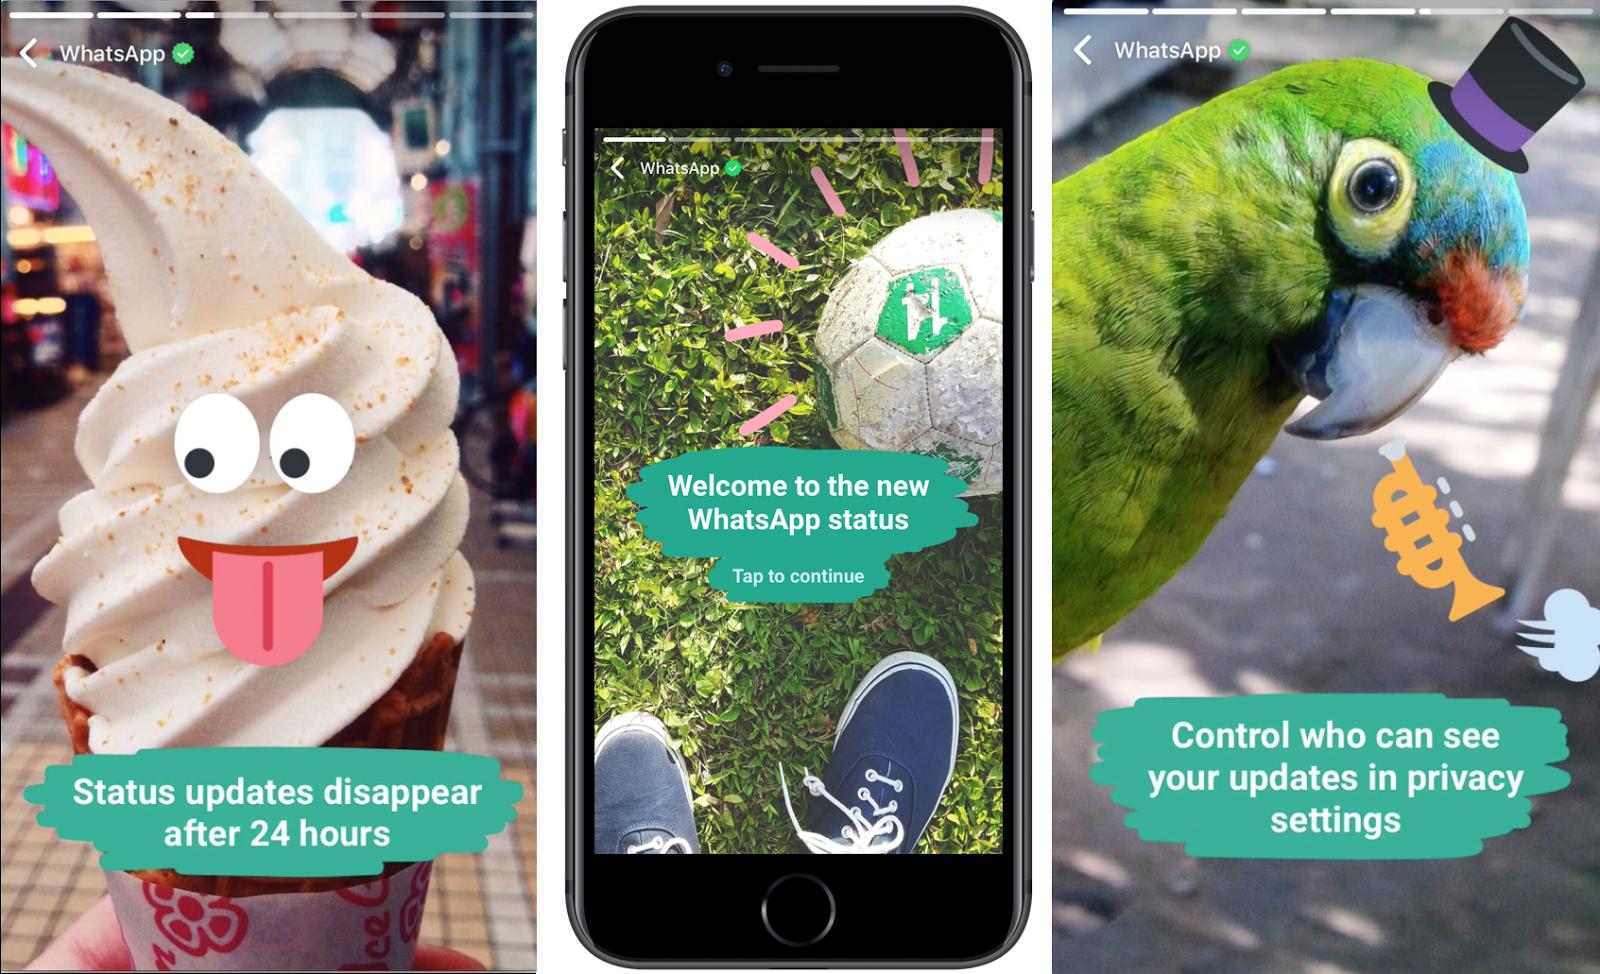 whatsapp status - كيفية تحميل فيديوهات وصور القصص على تطبيق واتساب